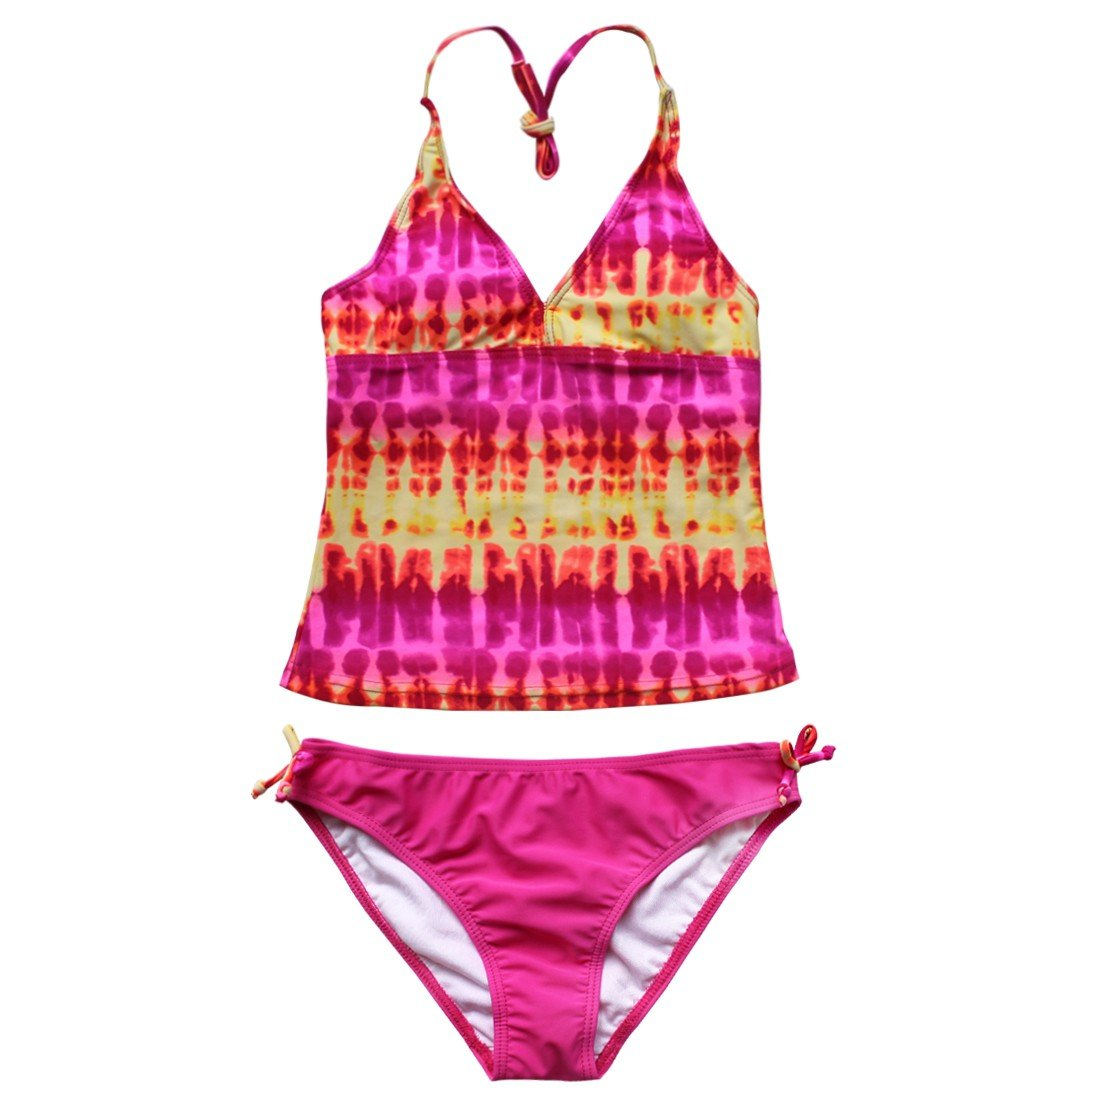 iiniim Girls Kids Floral Print Tankini Swimsuit Swimwear Bathing Suit Set Bikini Costume